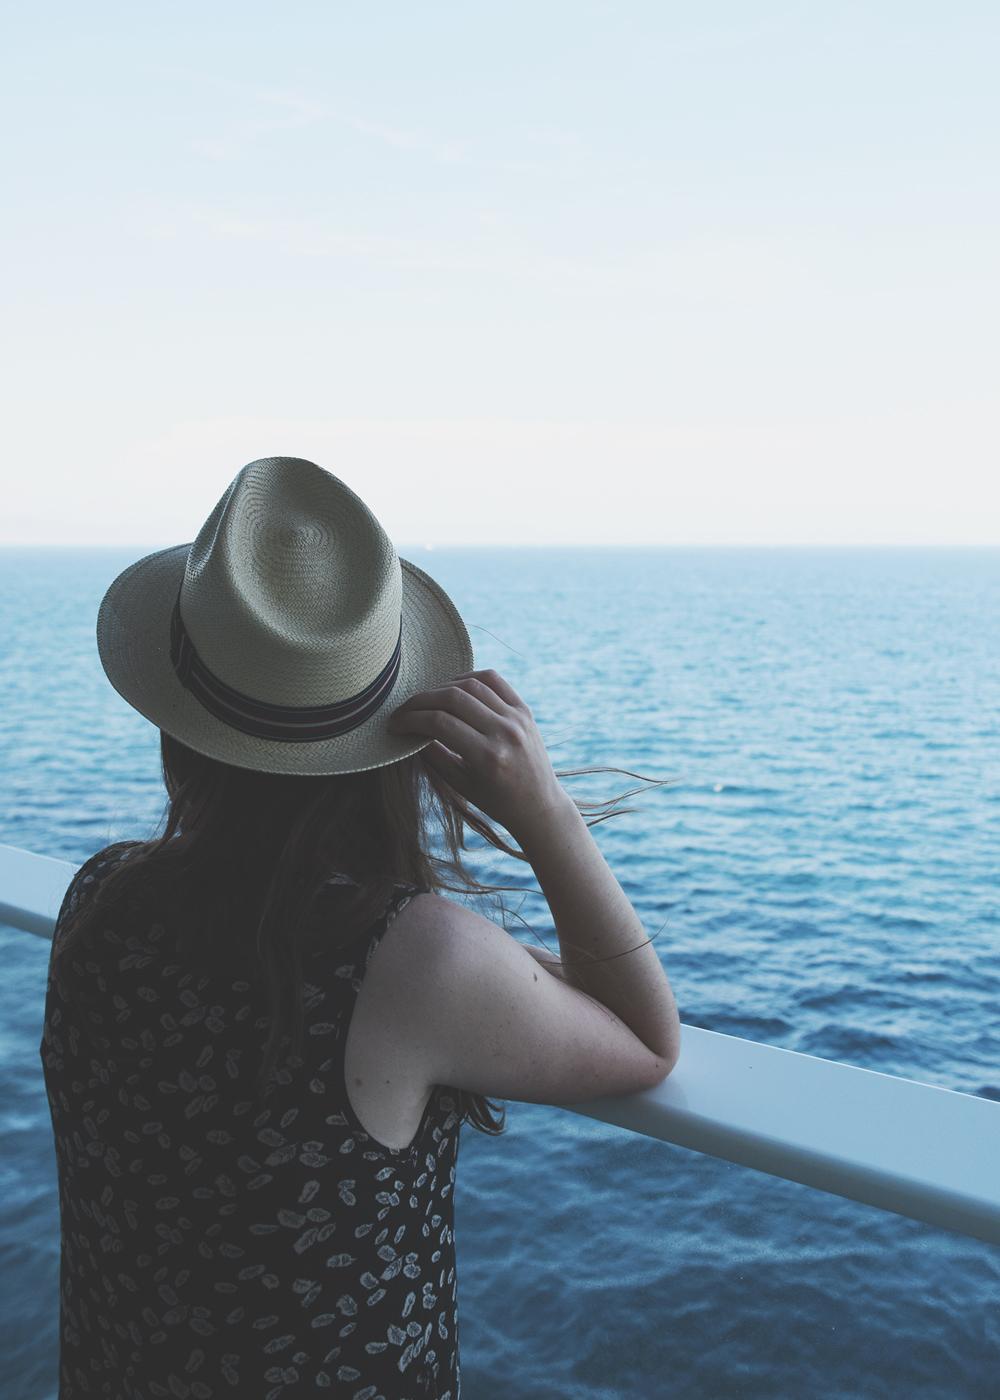 A bord de l'Harmony of the seas